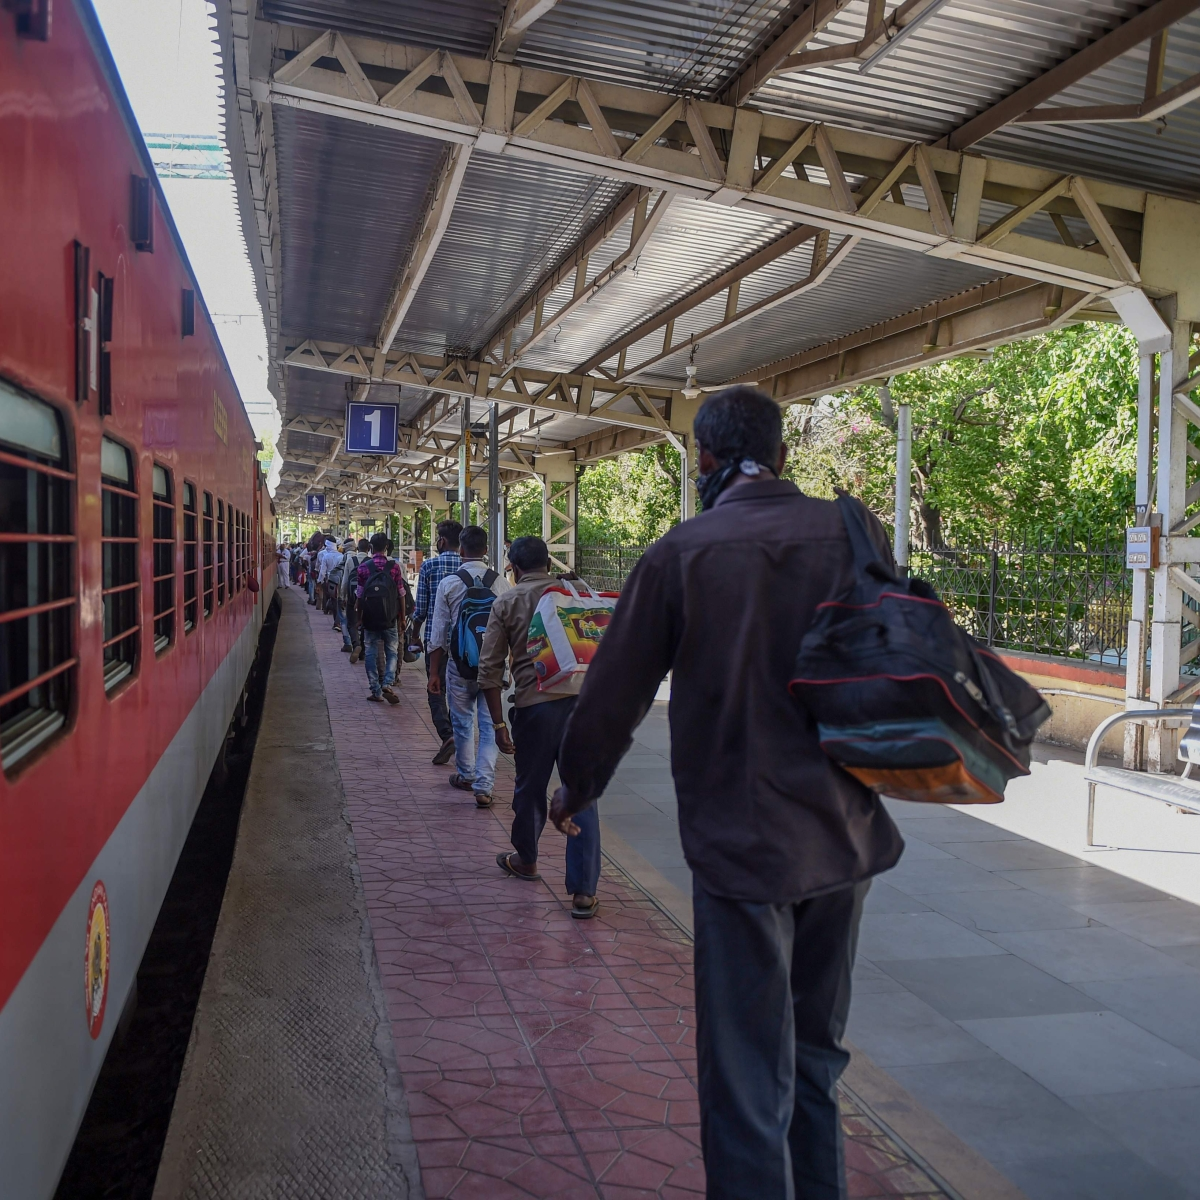 Mumbai: Special Shramik train leaves for Gorakhpur with 1104 happy migrant labourers